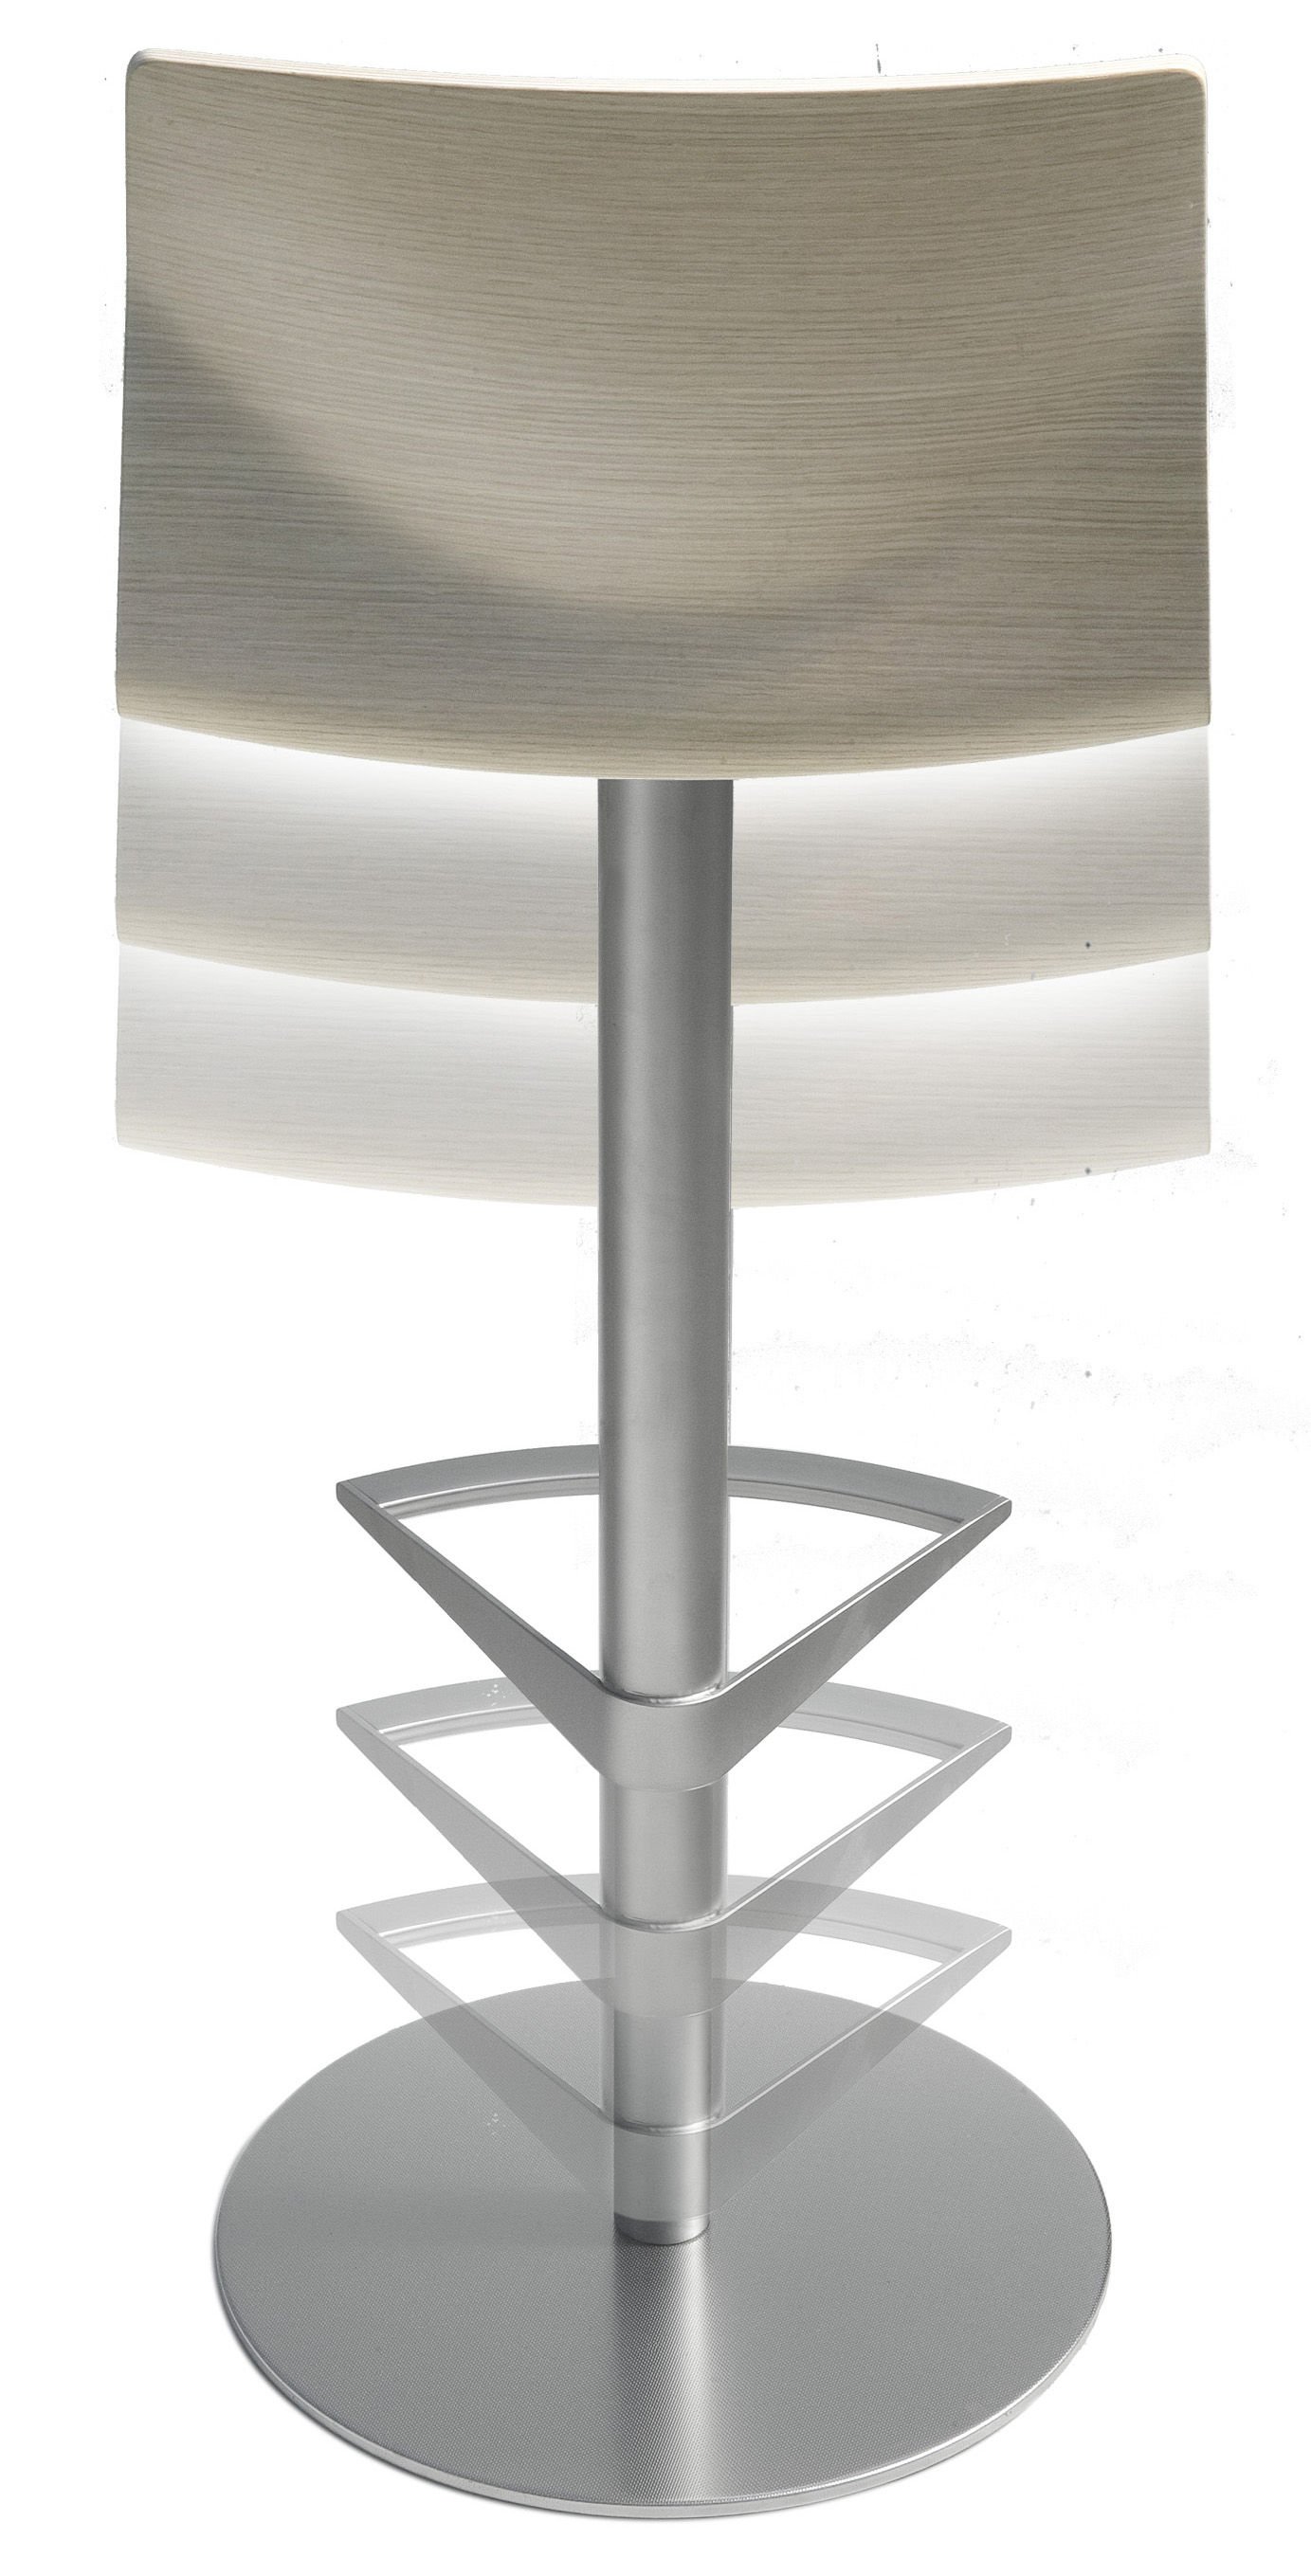 tabouret haut r glable kai assise bois pivotante noir vein lapalma made in design. Black Bedroom Furniture Sets. Home Design Ideas